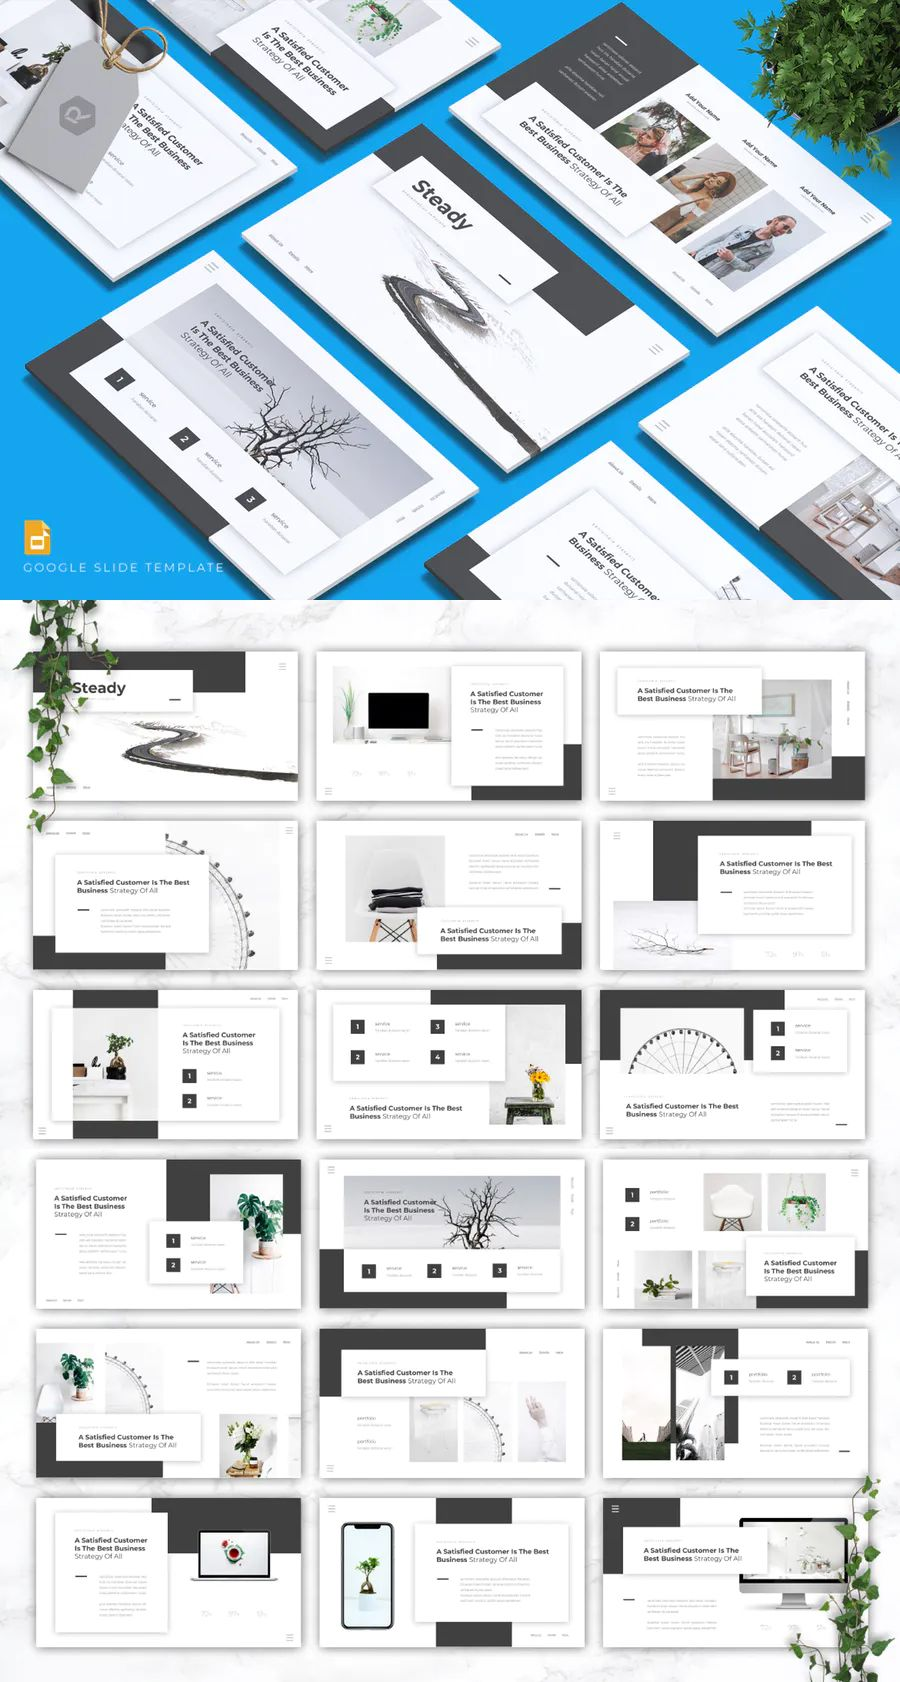 Google slides template. 30 slides Powerpoint templates